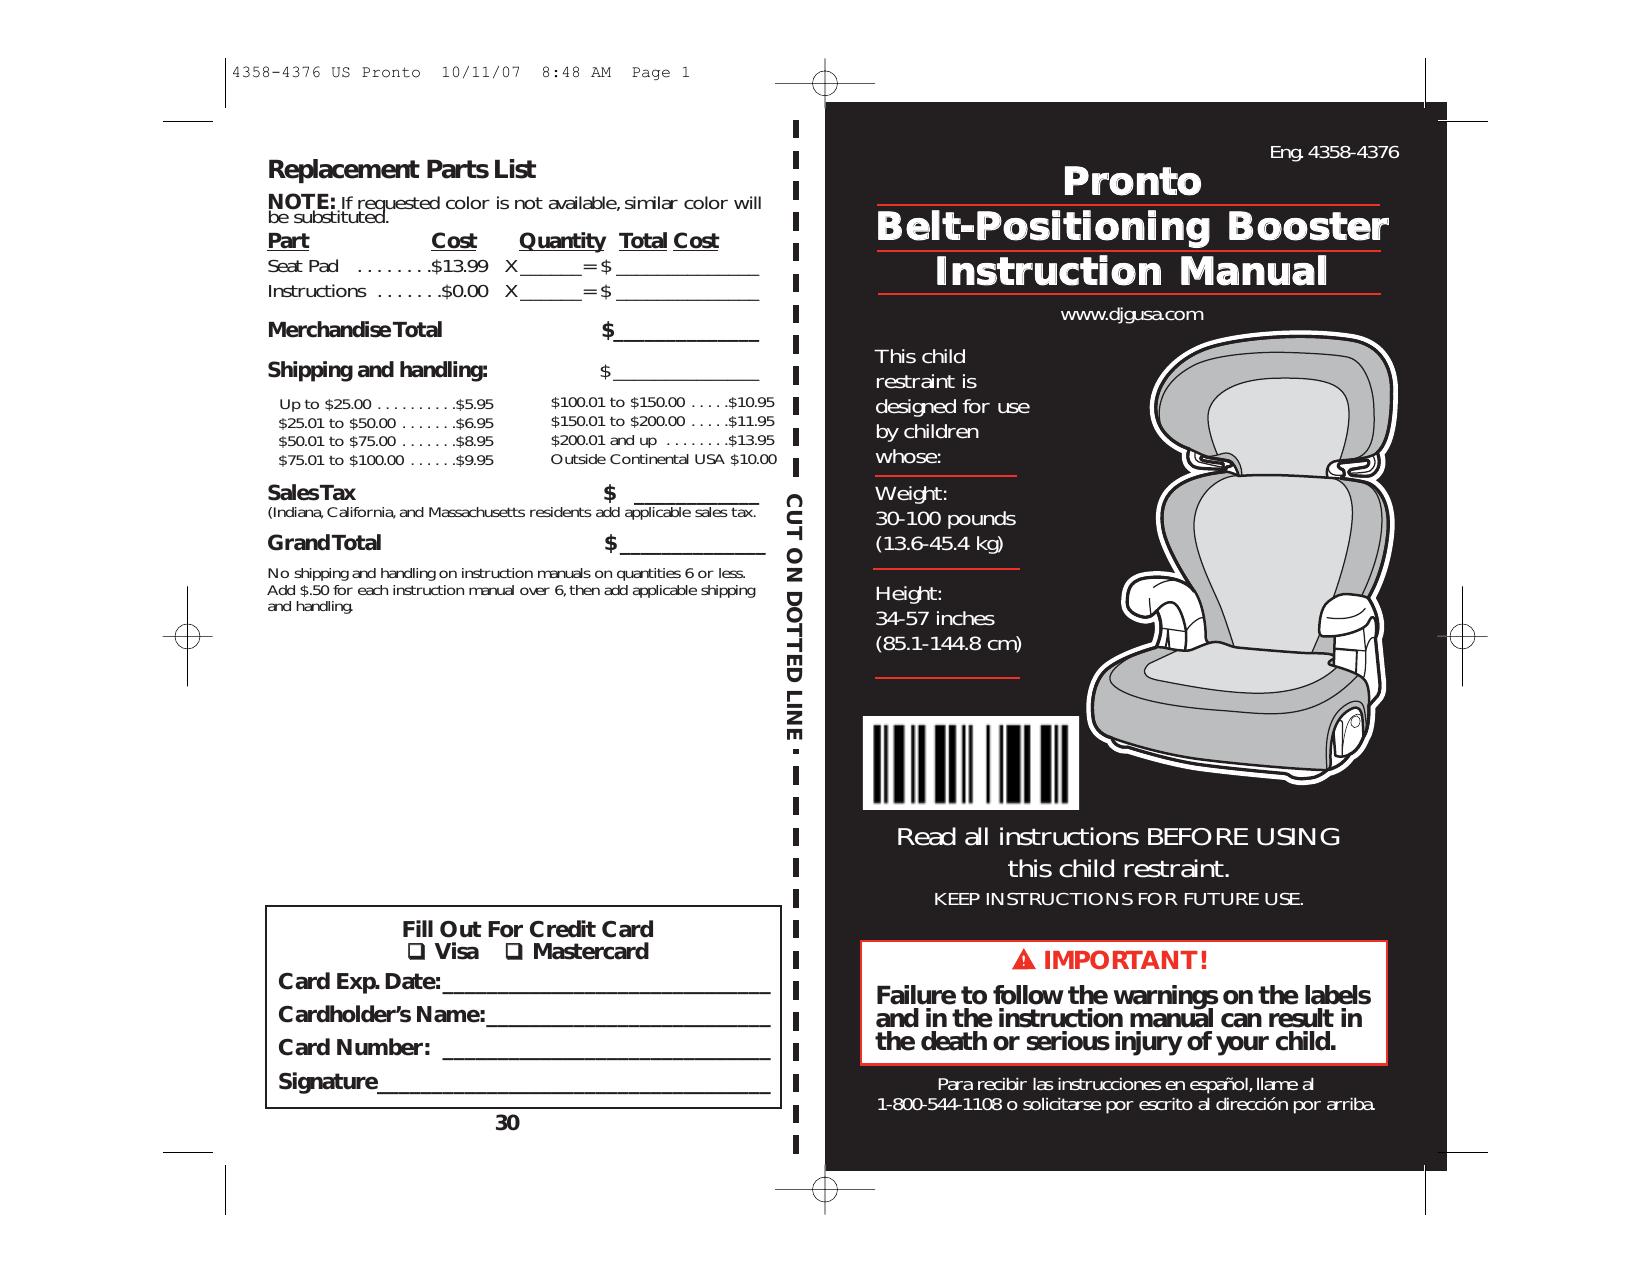 pronto belt positioning booster instruction manual manualzz com rh manualzz com Us Continental States USA Map